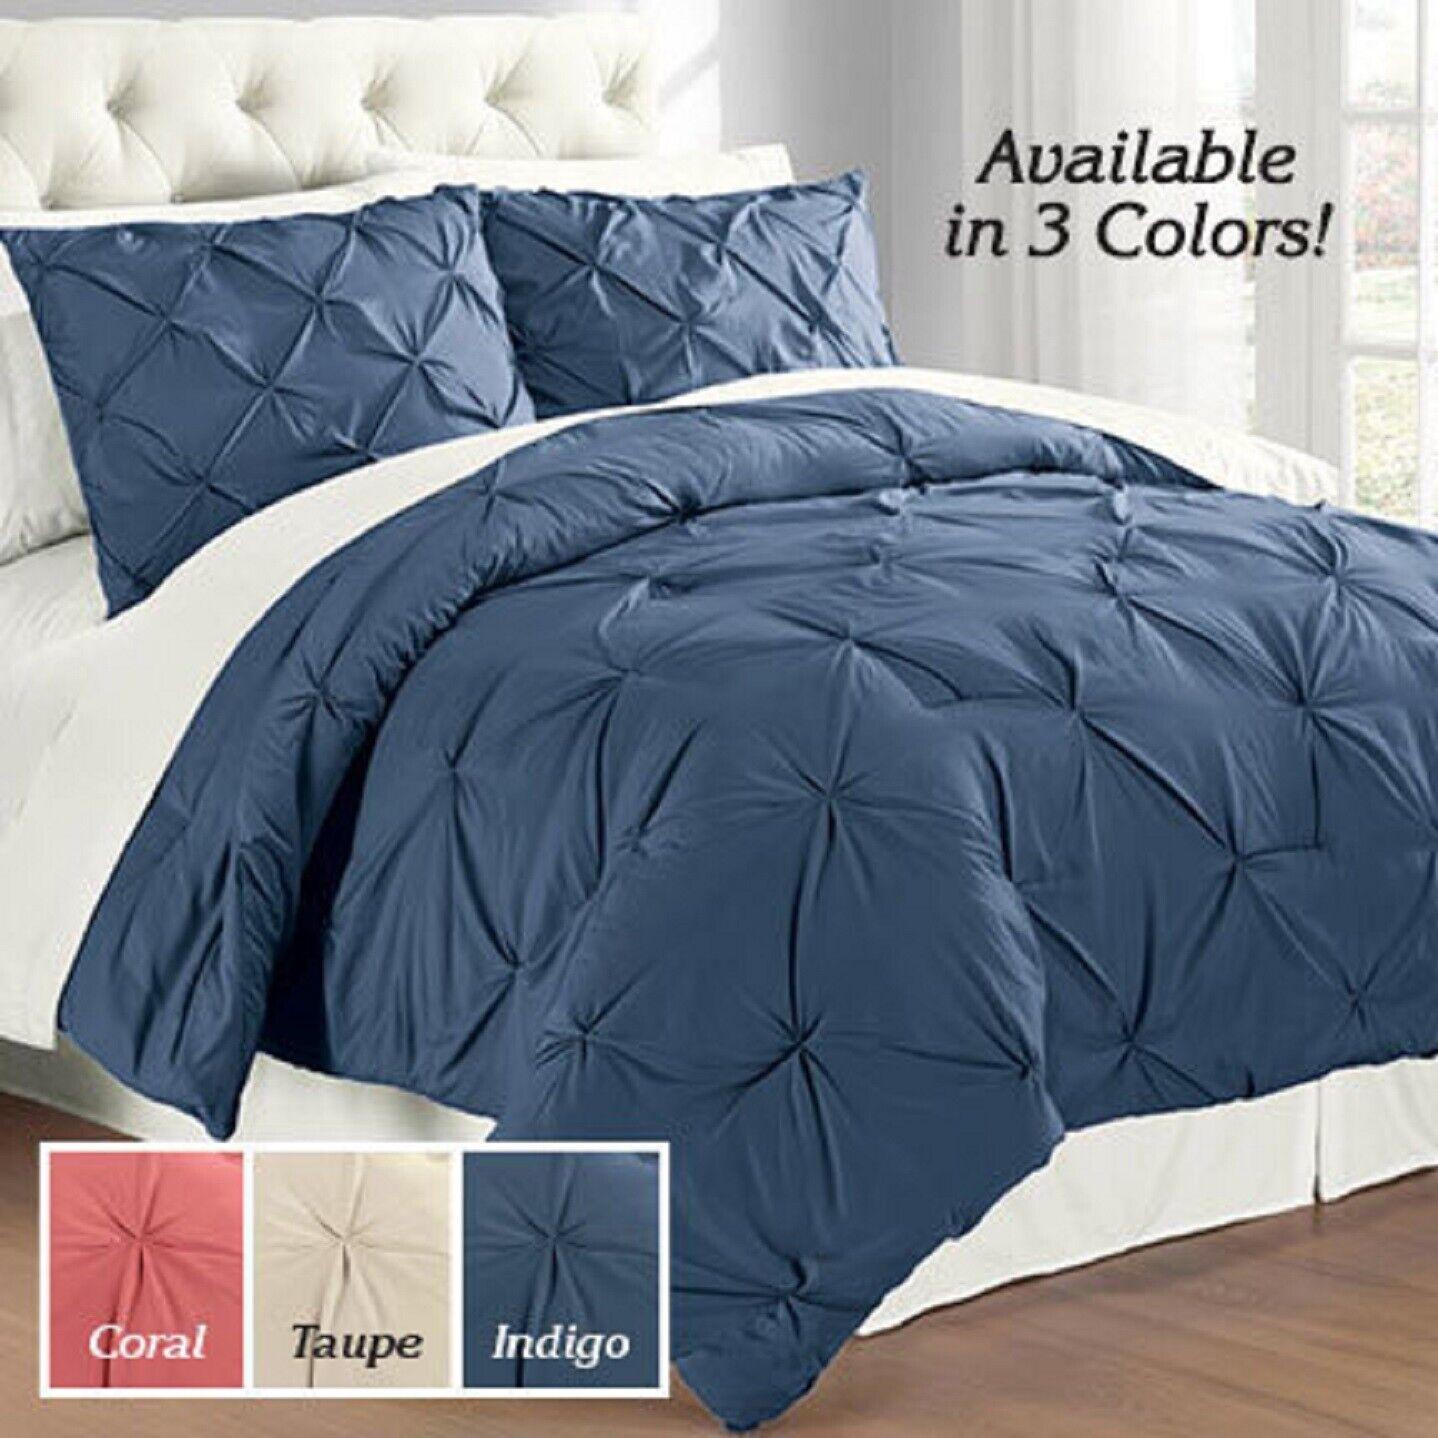 Solid Pintuck Comforter Set 3 Piece King Queen Full Choose Color Modern Living Bedding